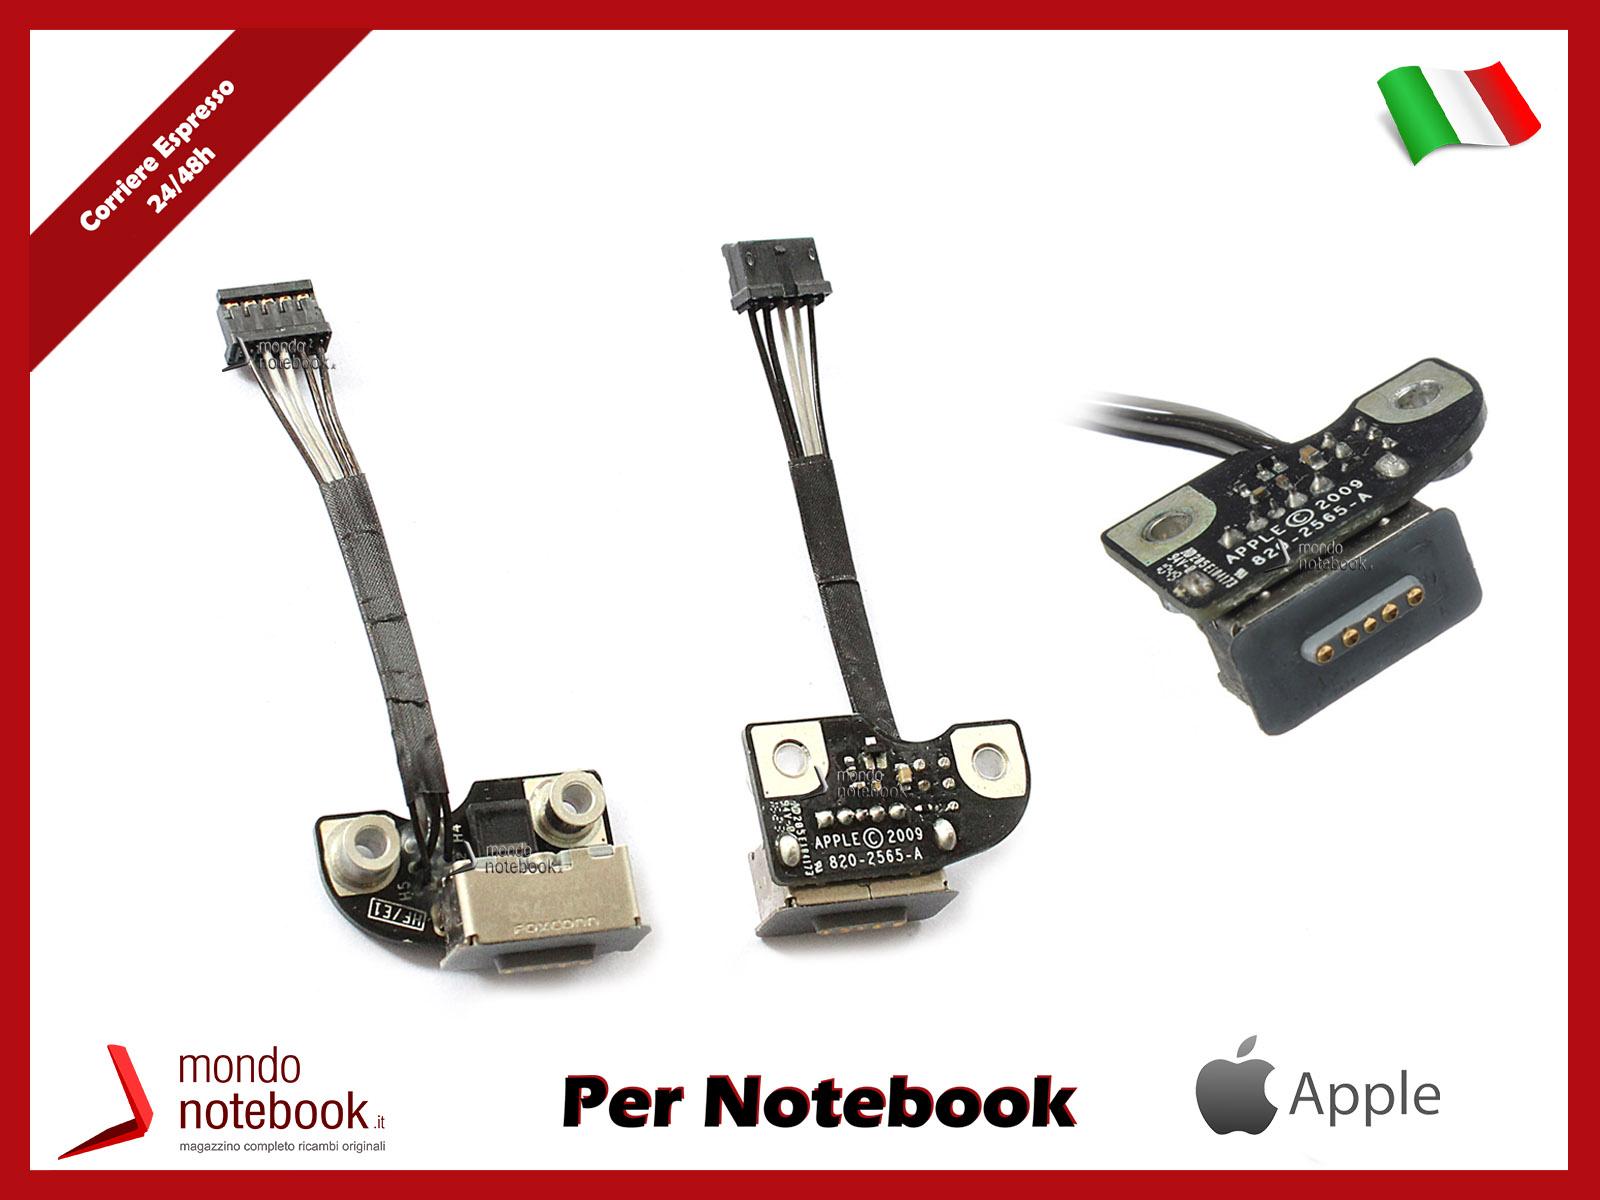 Connettore di Alimentazione DC Power Jack APPLE Macbook Pro MagSafe A1278 A1286 A1297 Board